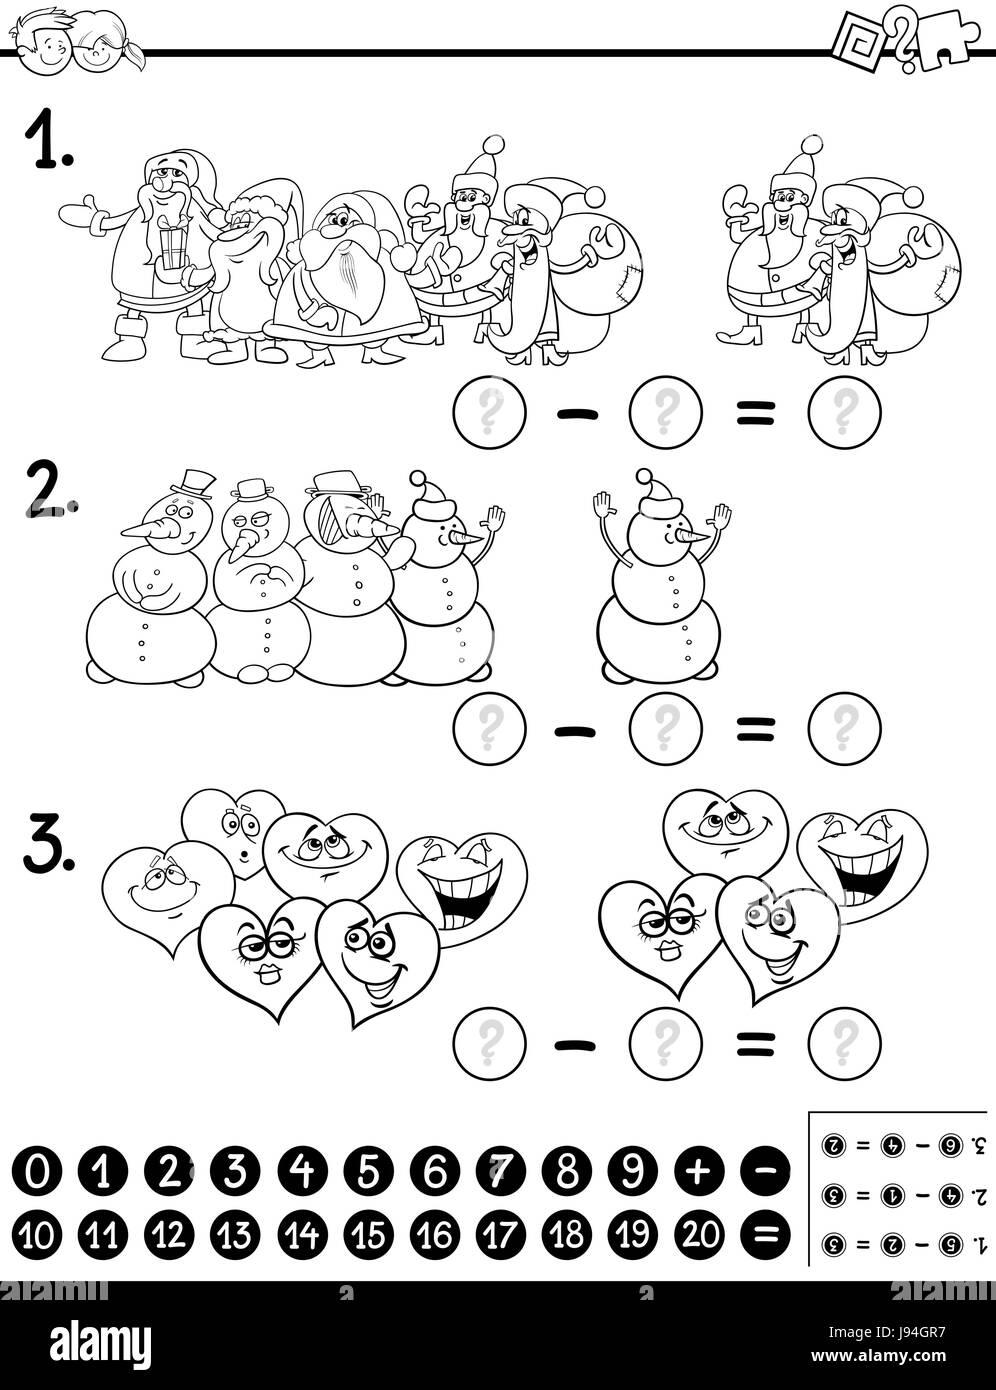 Calculate Game Coloring Stockfotos & Calculate Game Coloring Bilder ...